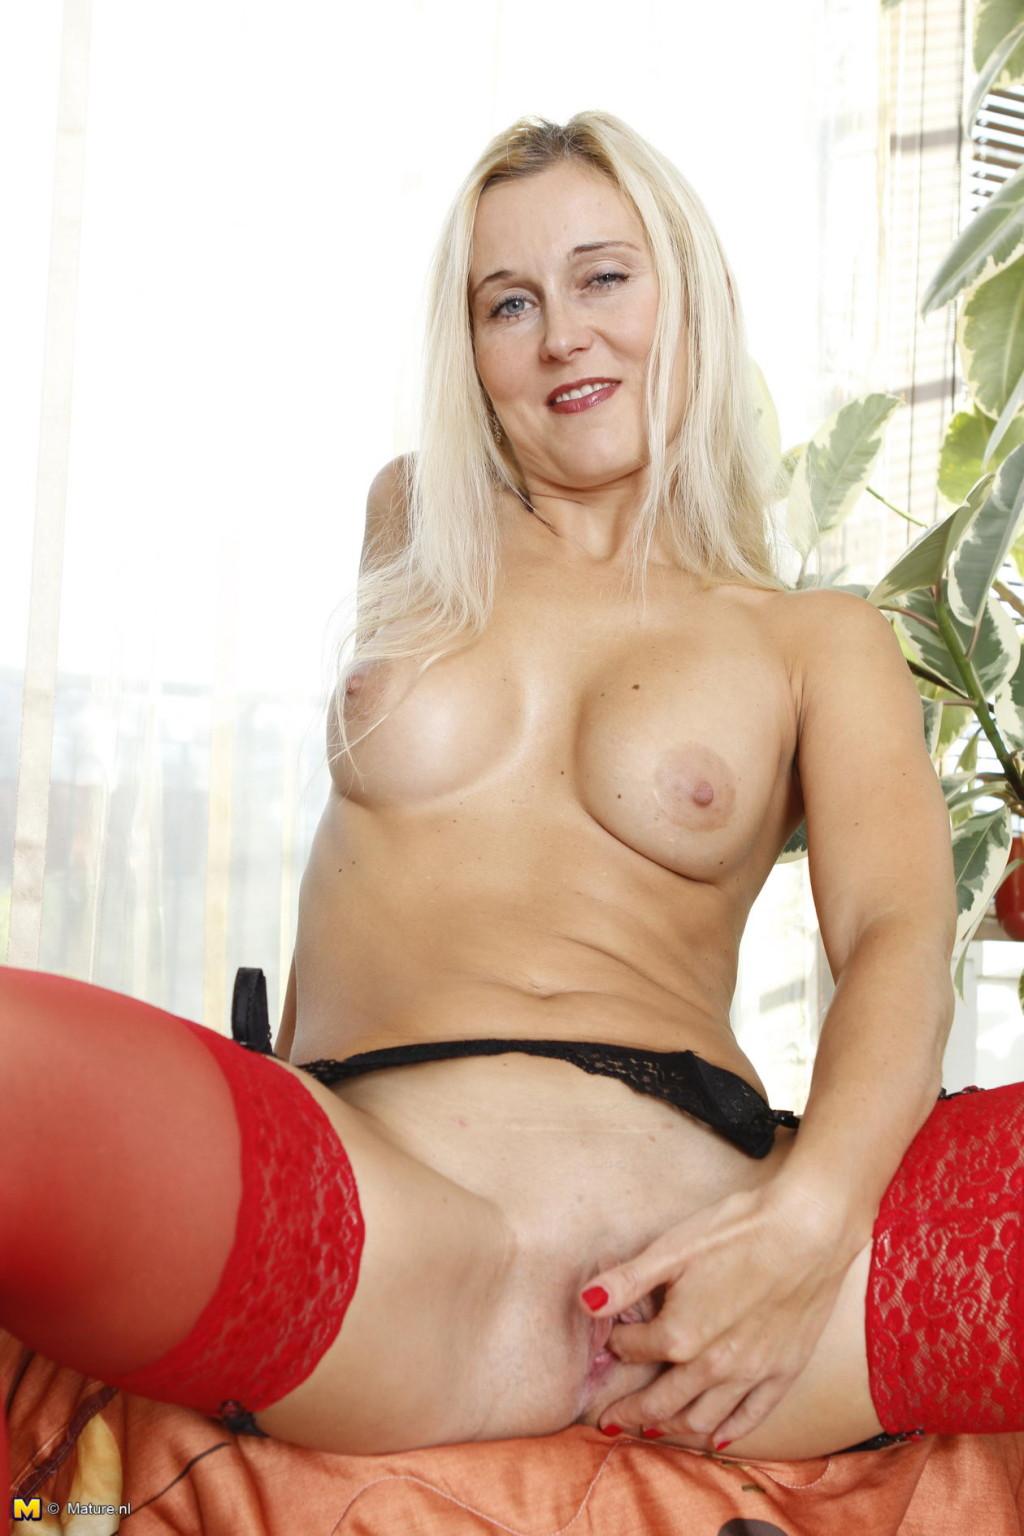 Зрелая женщина - Галерея № 3550404